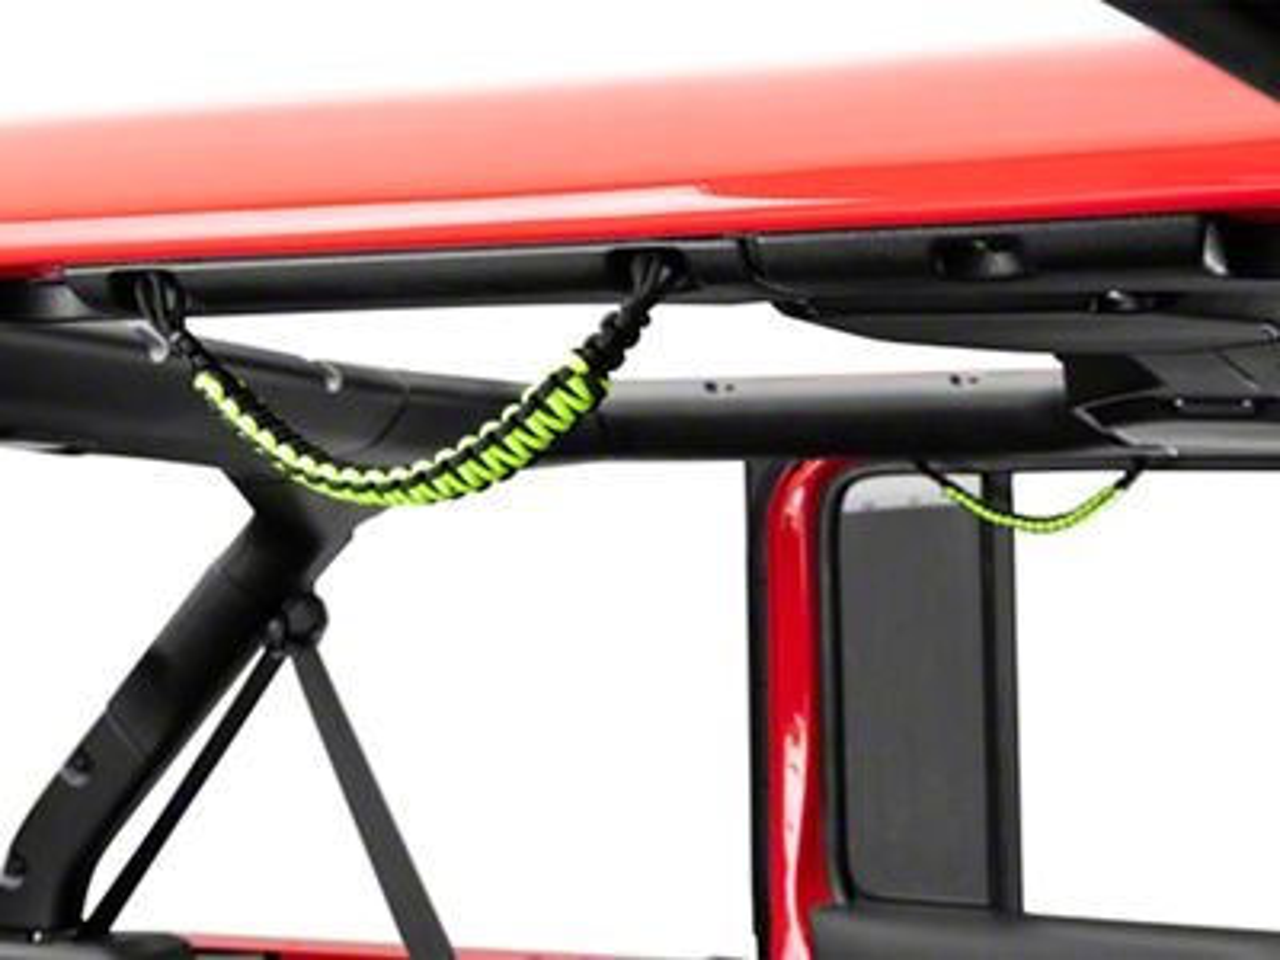 Alterum Rear Soundbar Paracord Grab Handles - Black and Neon Green (07-18 Jeep Wrangler JK 4 Door; 18-19 Jeep Wrangler JL 4 Door)